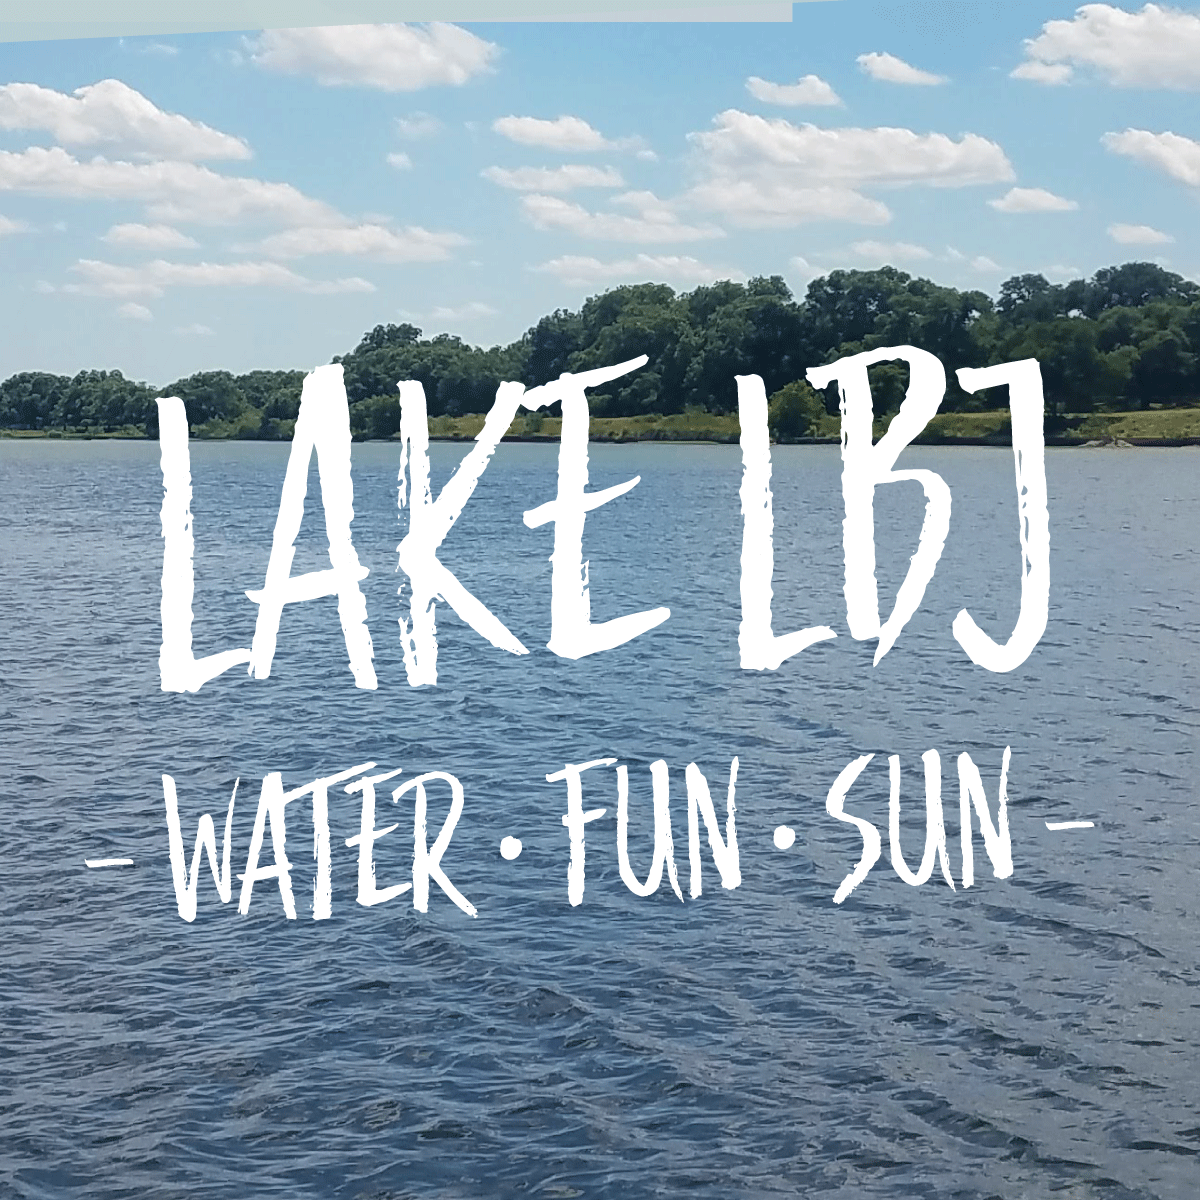 Lake LBJ.png